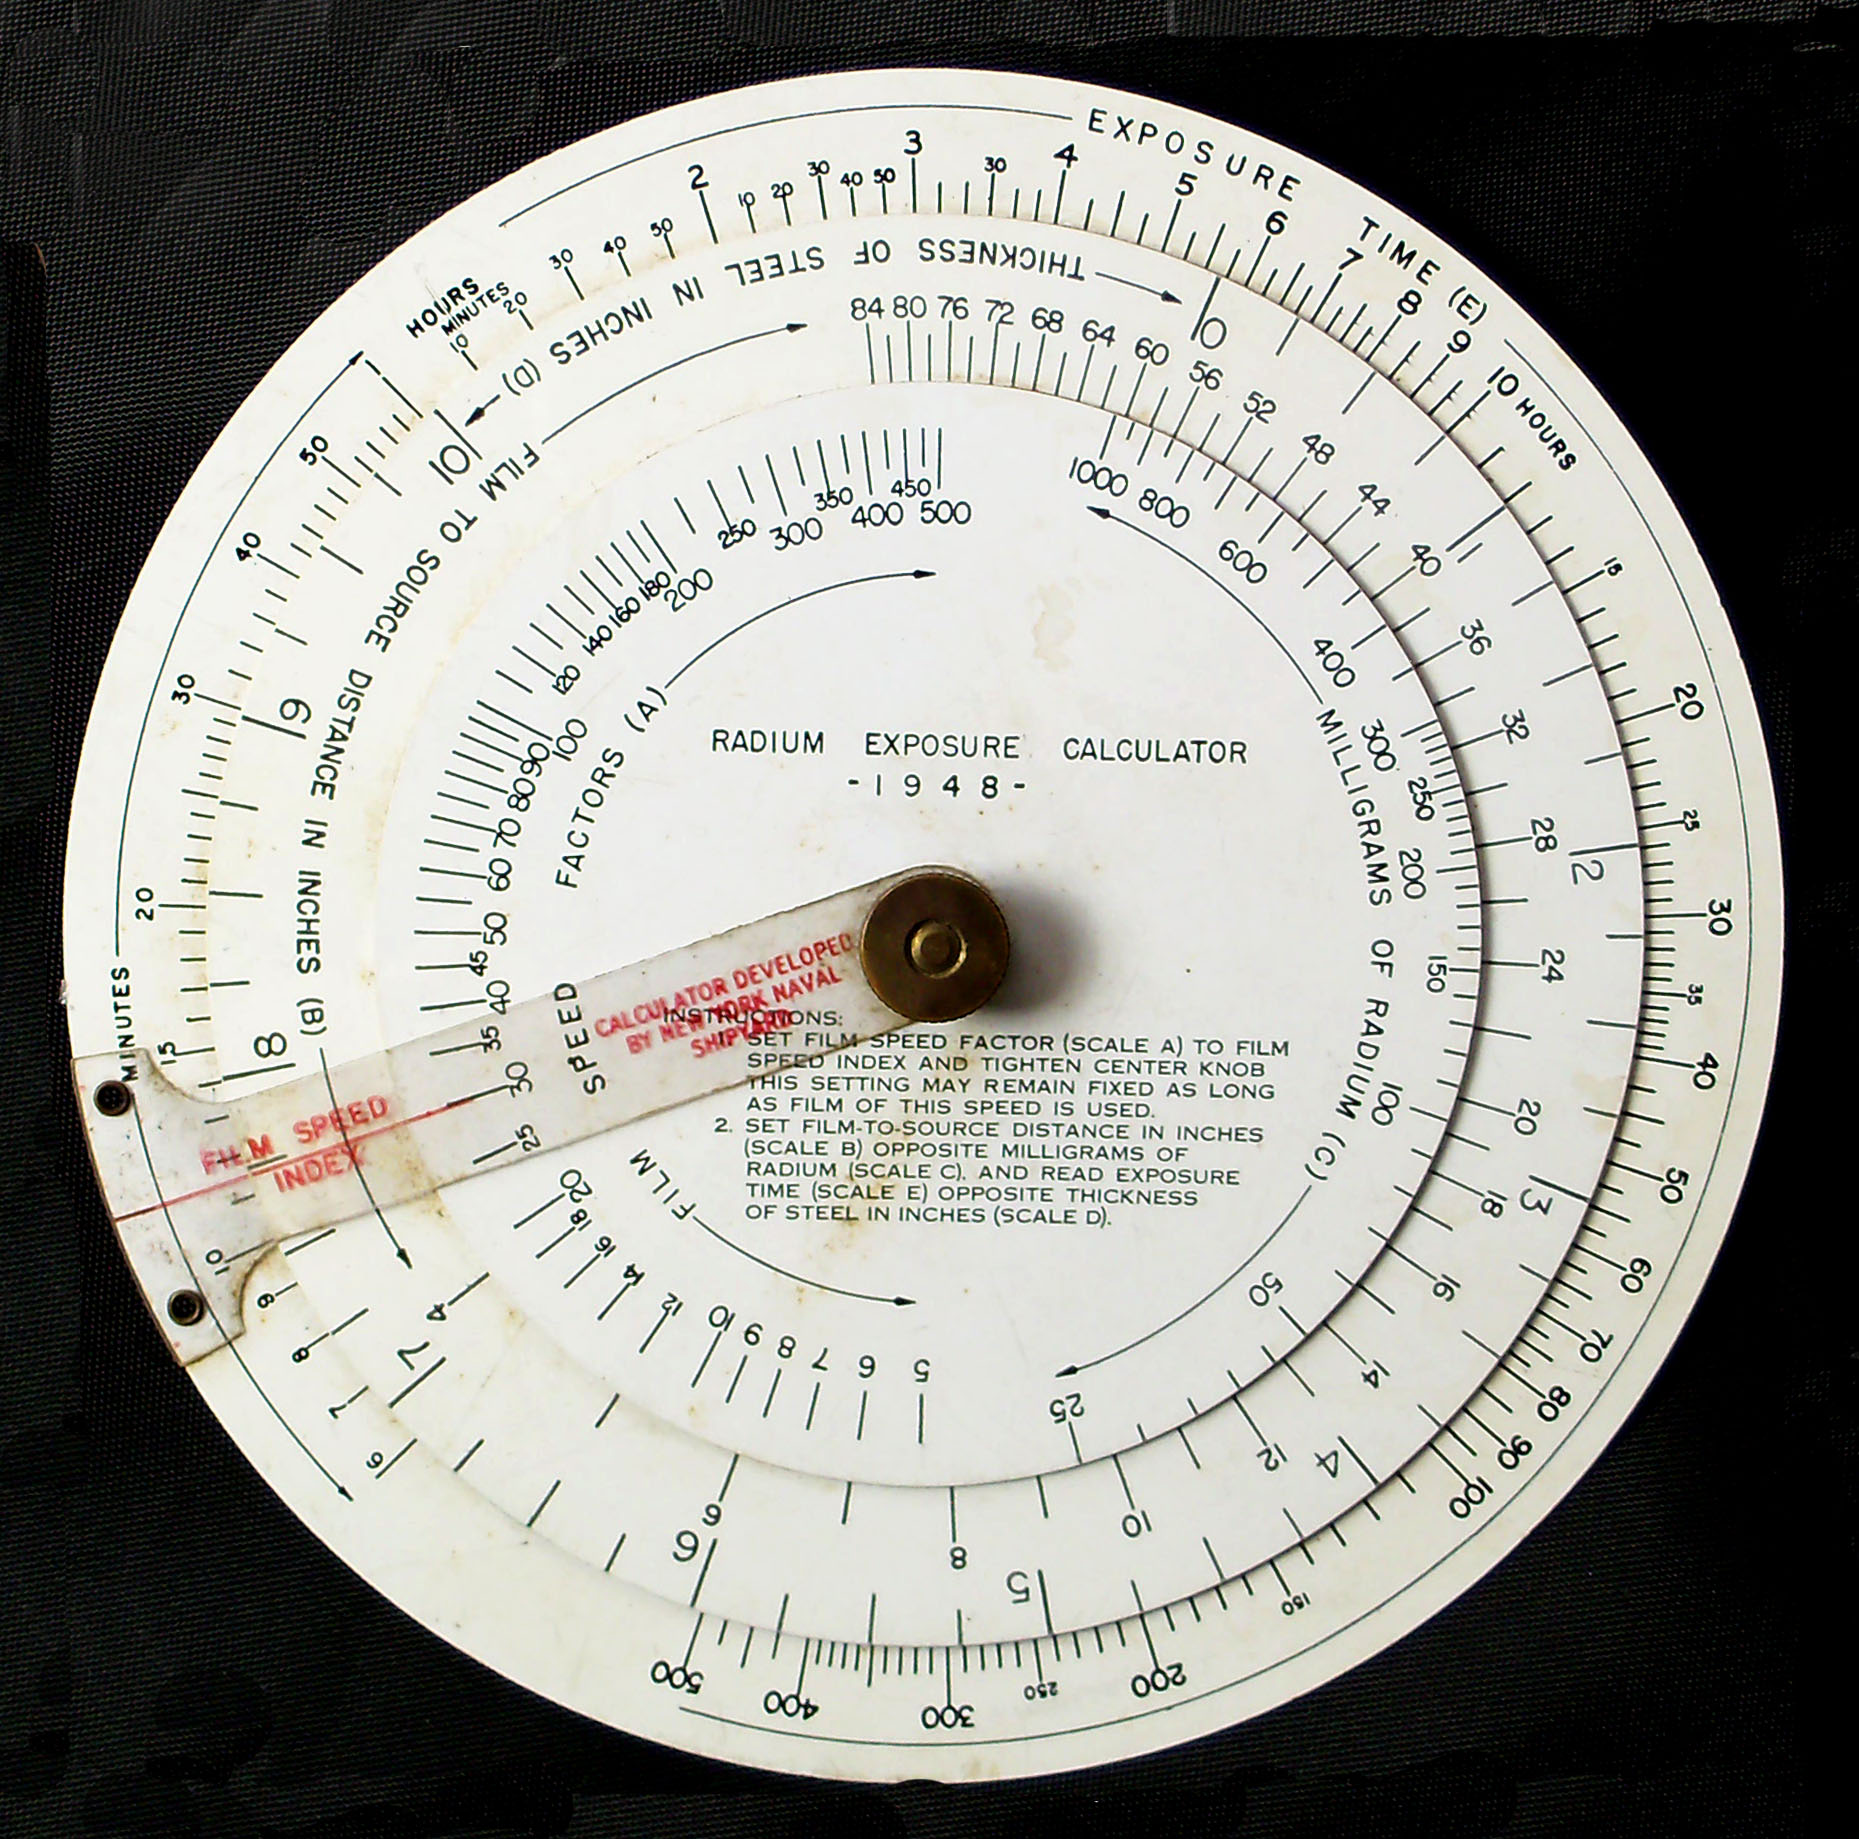 regle-circulaire-radioactivite-13